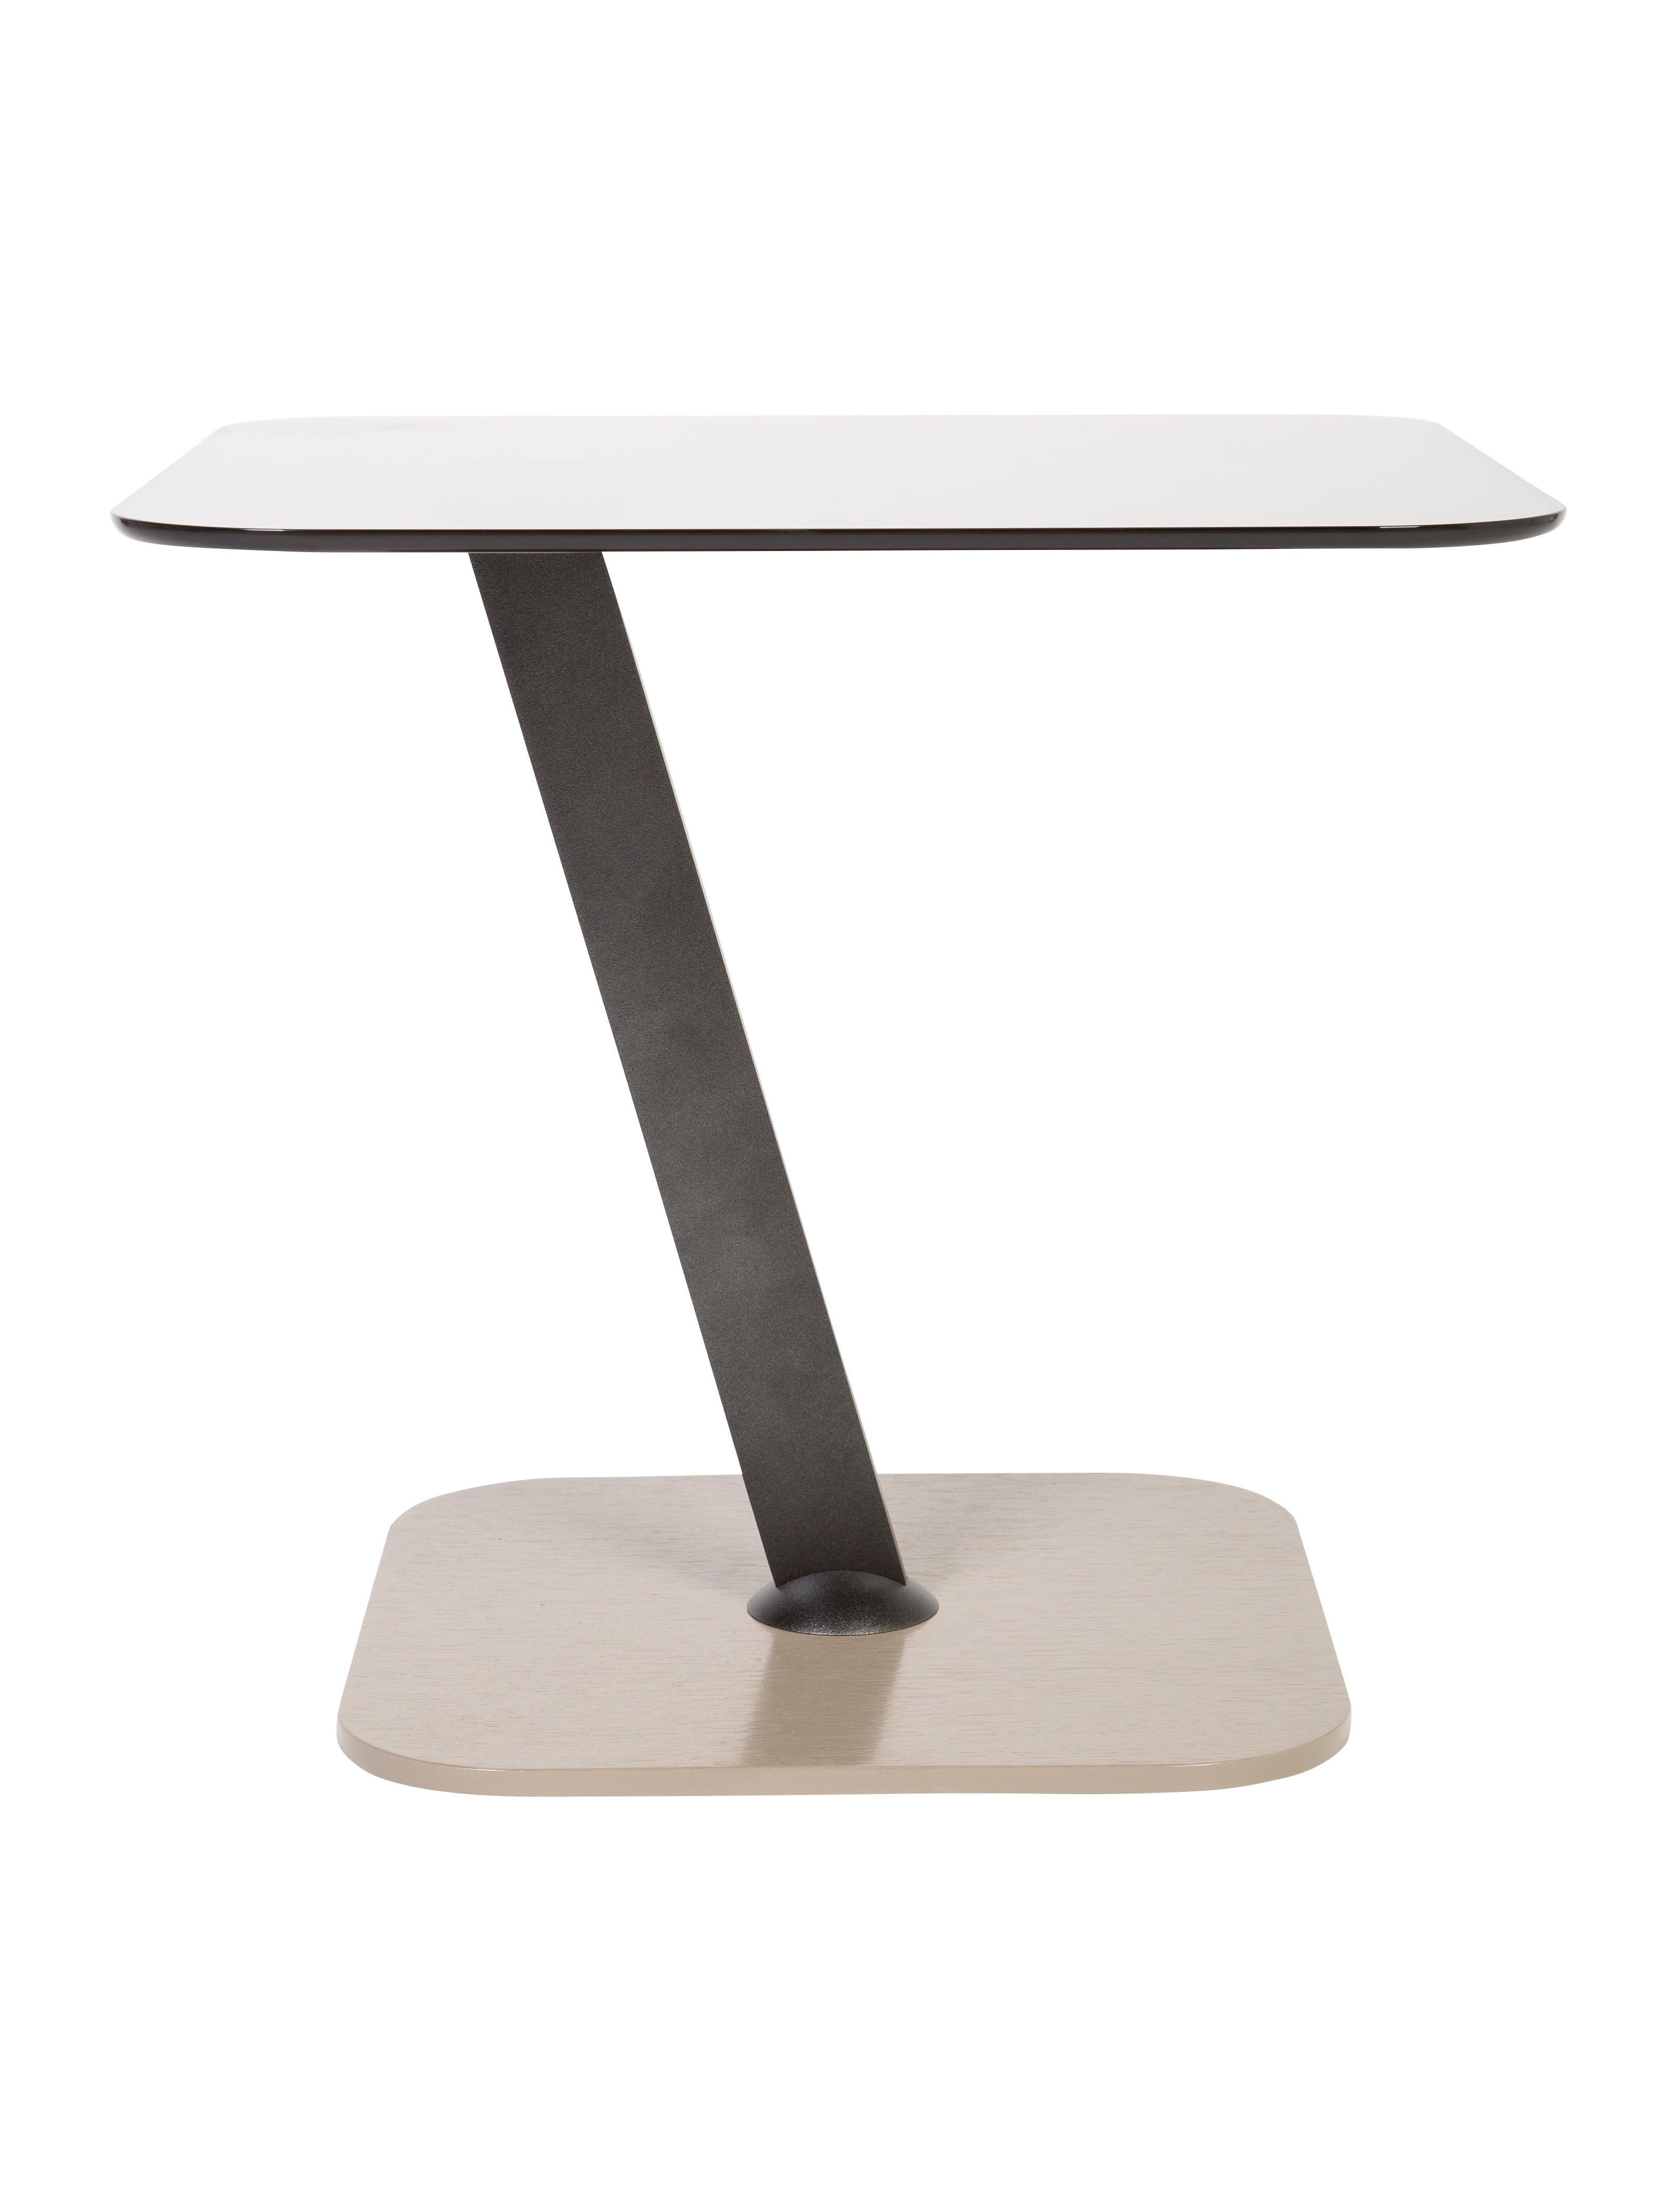 Roche Bobois Glass Pedestal Table